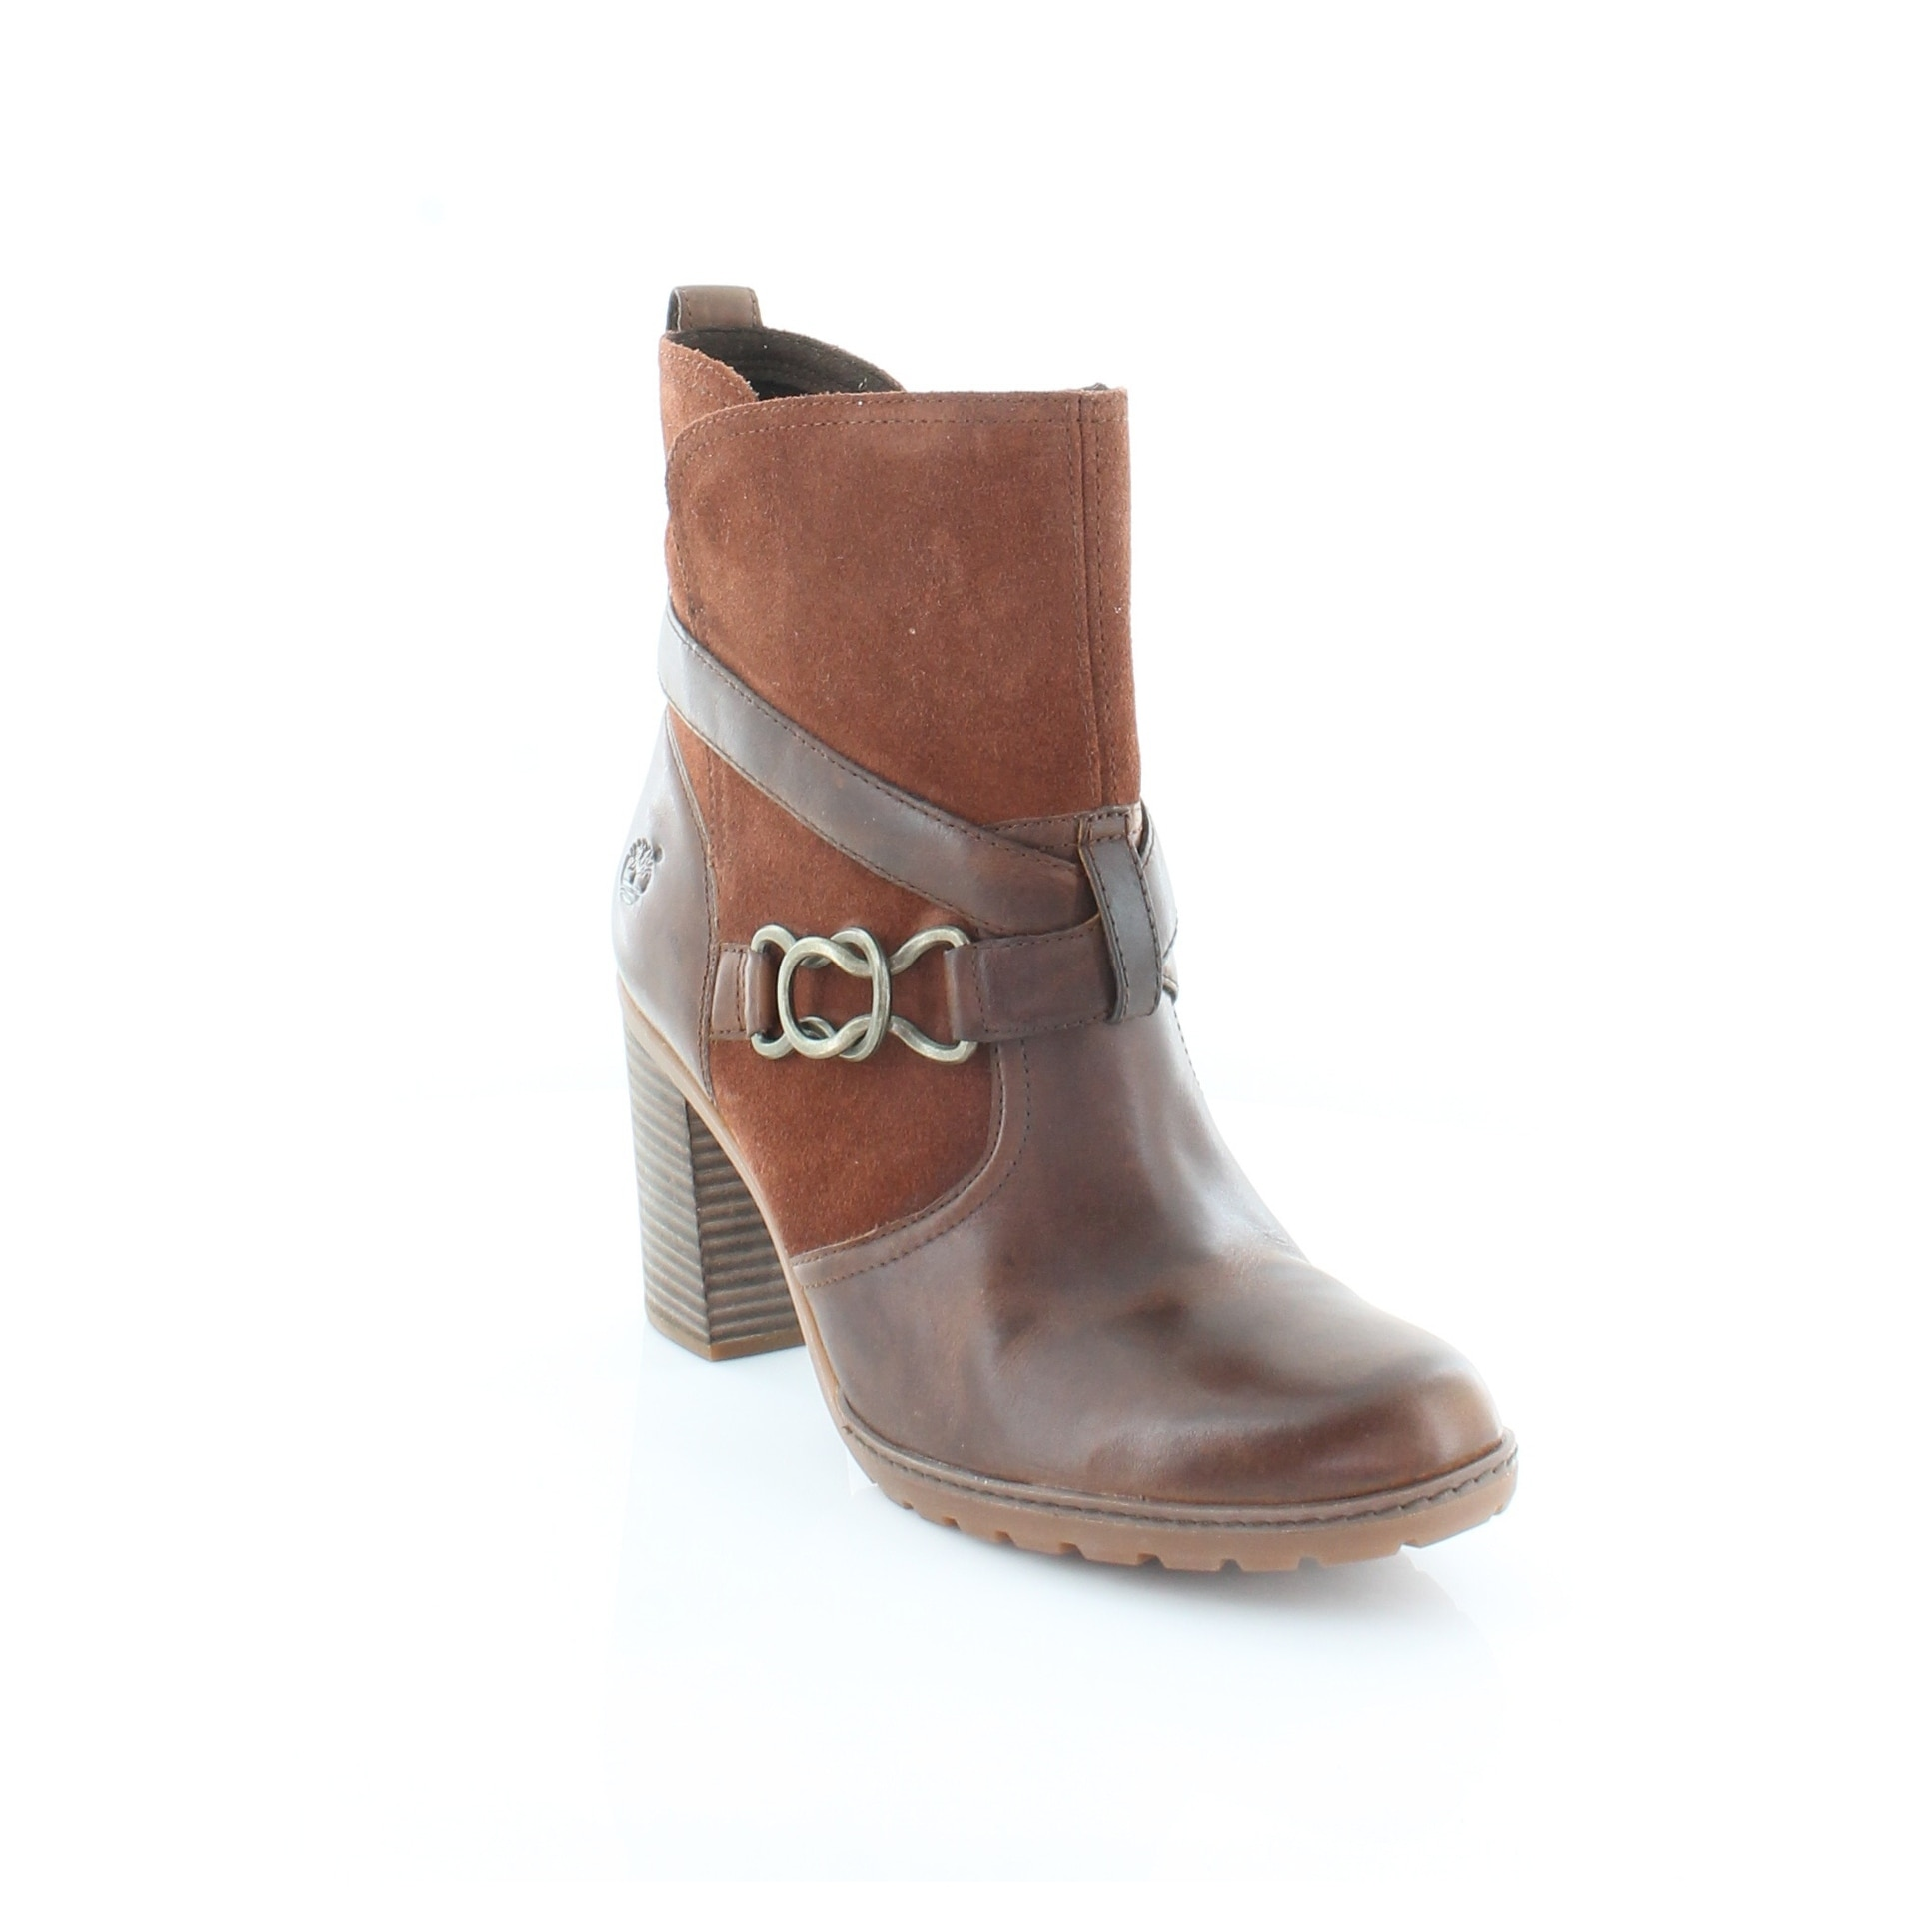 858867f83776 Shop Timberland Dennett Women s Boots TB0A168M - 9.5 - Free Shipping ...